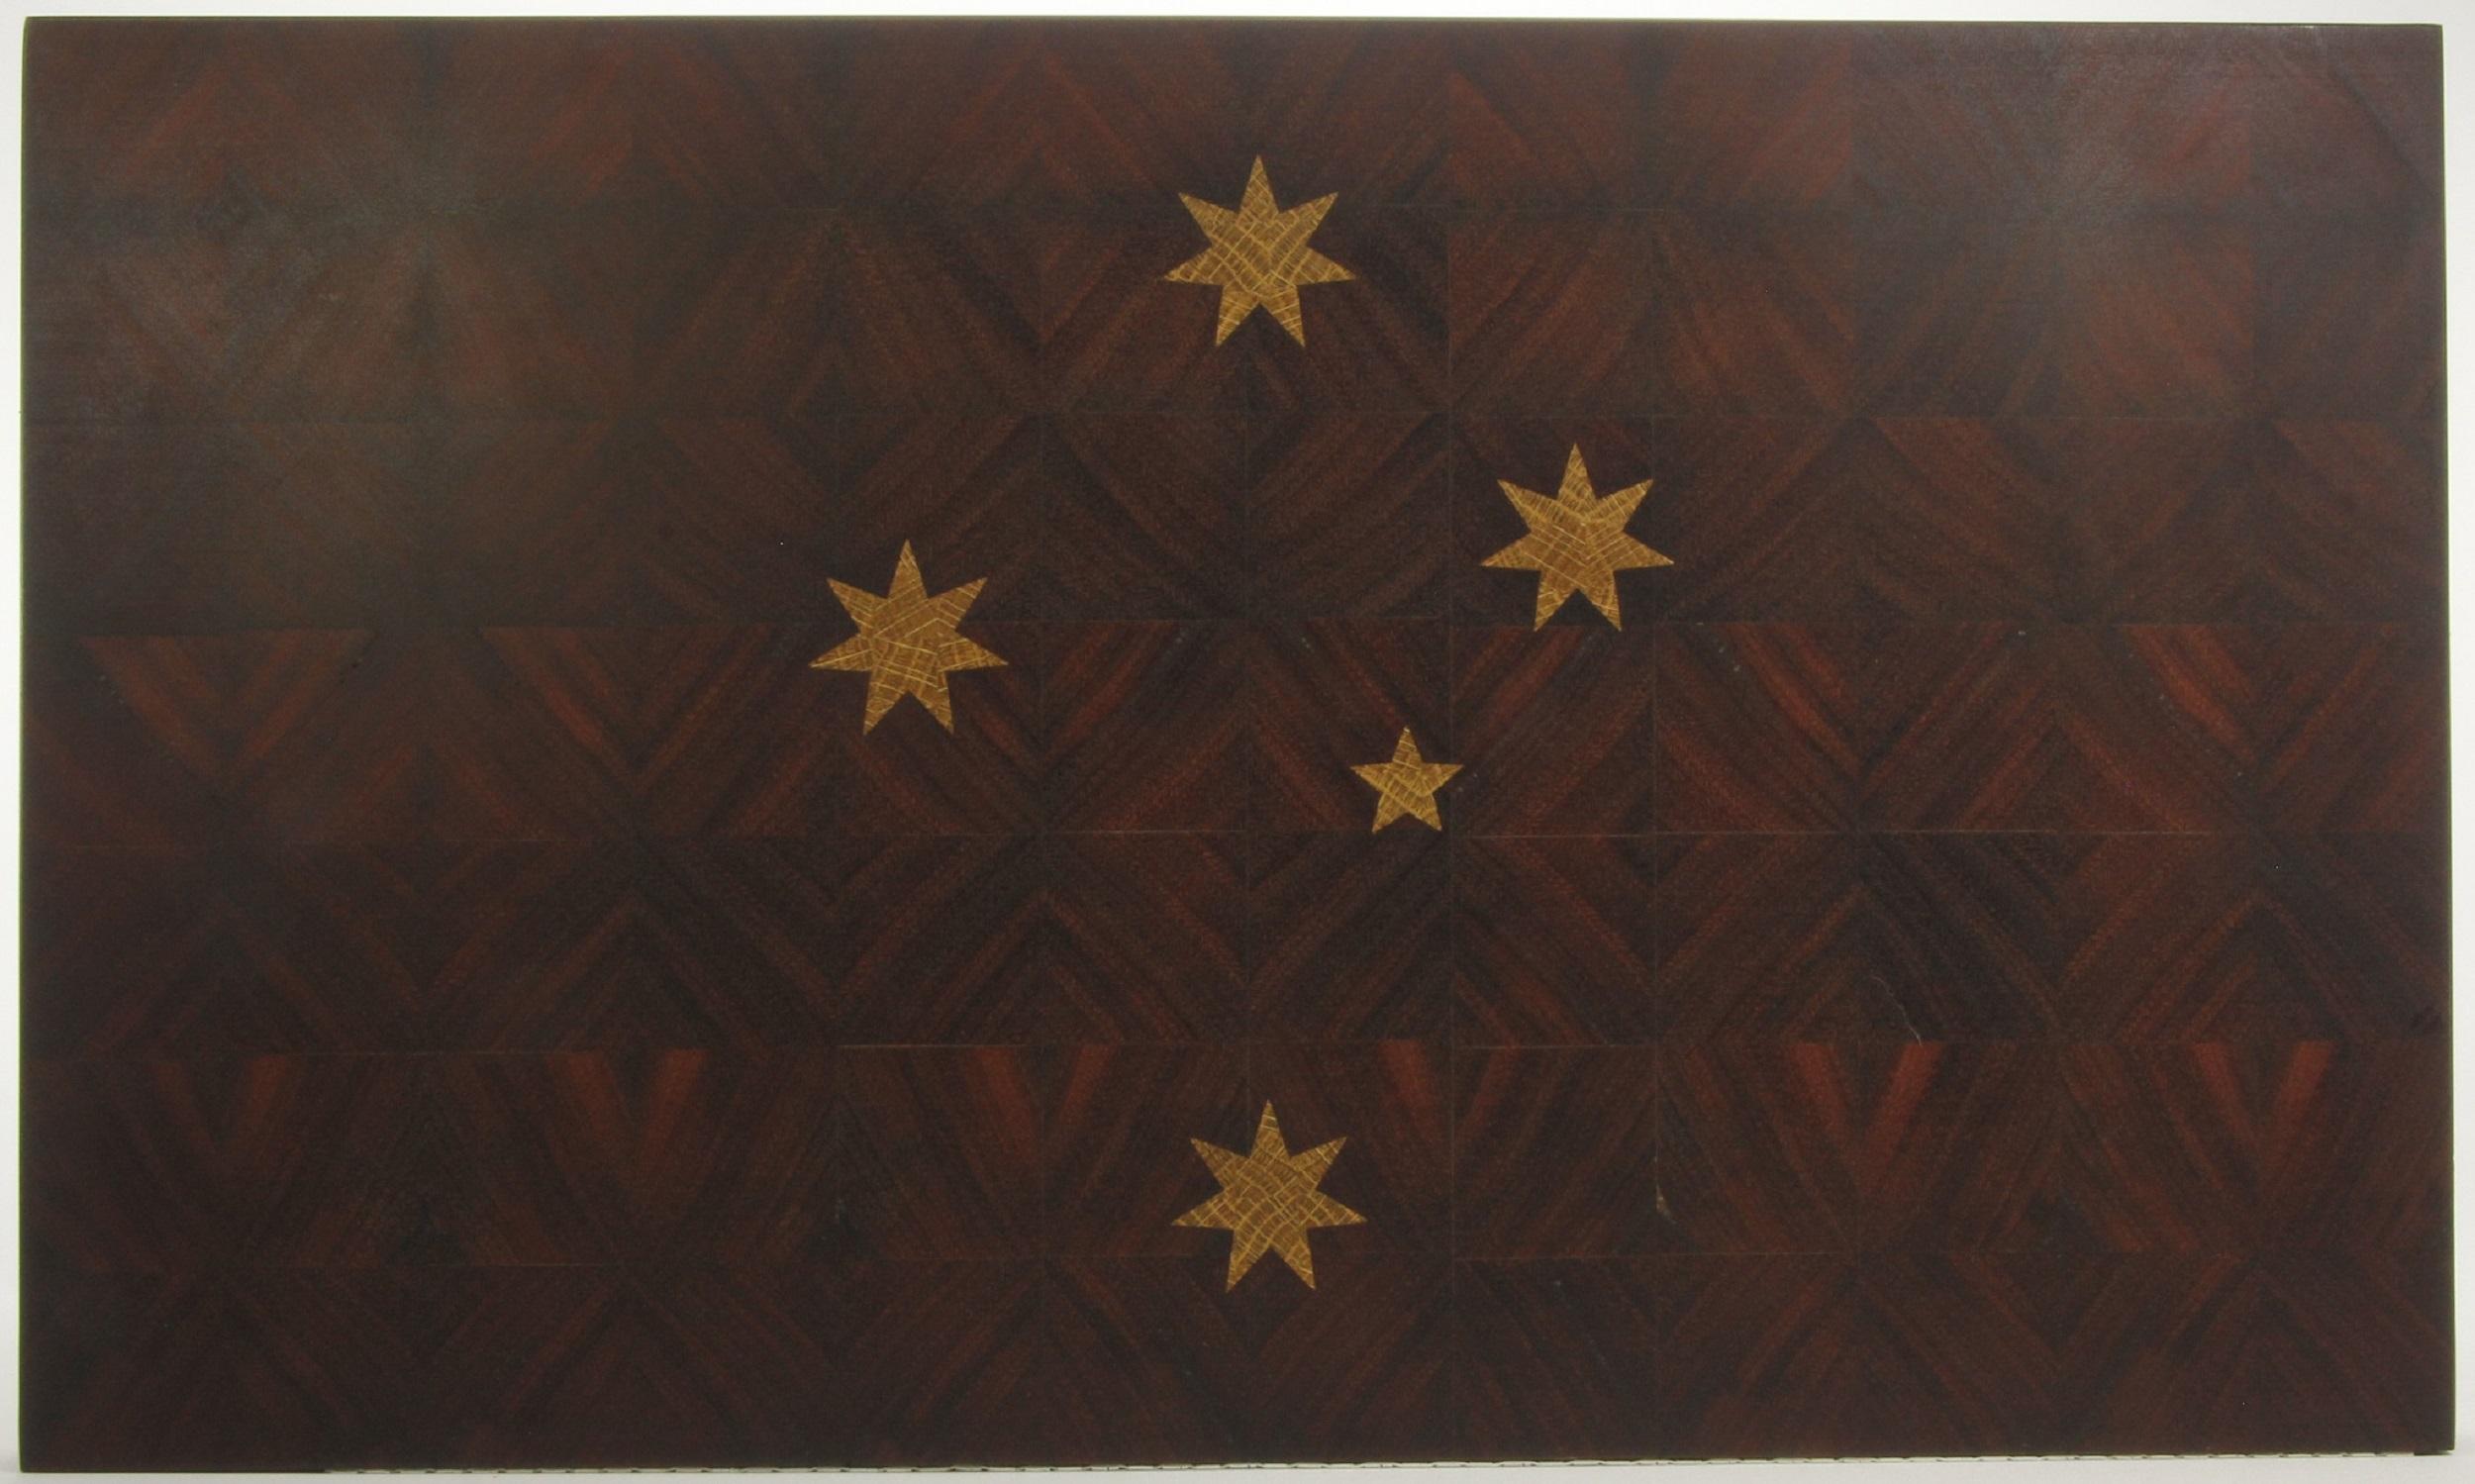 Jarrah End Grain Board with Tasmanian Oak Inlay